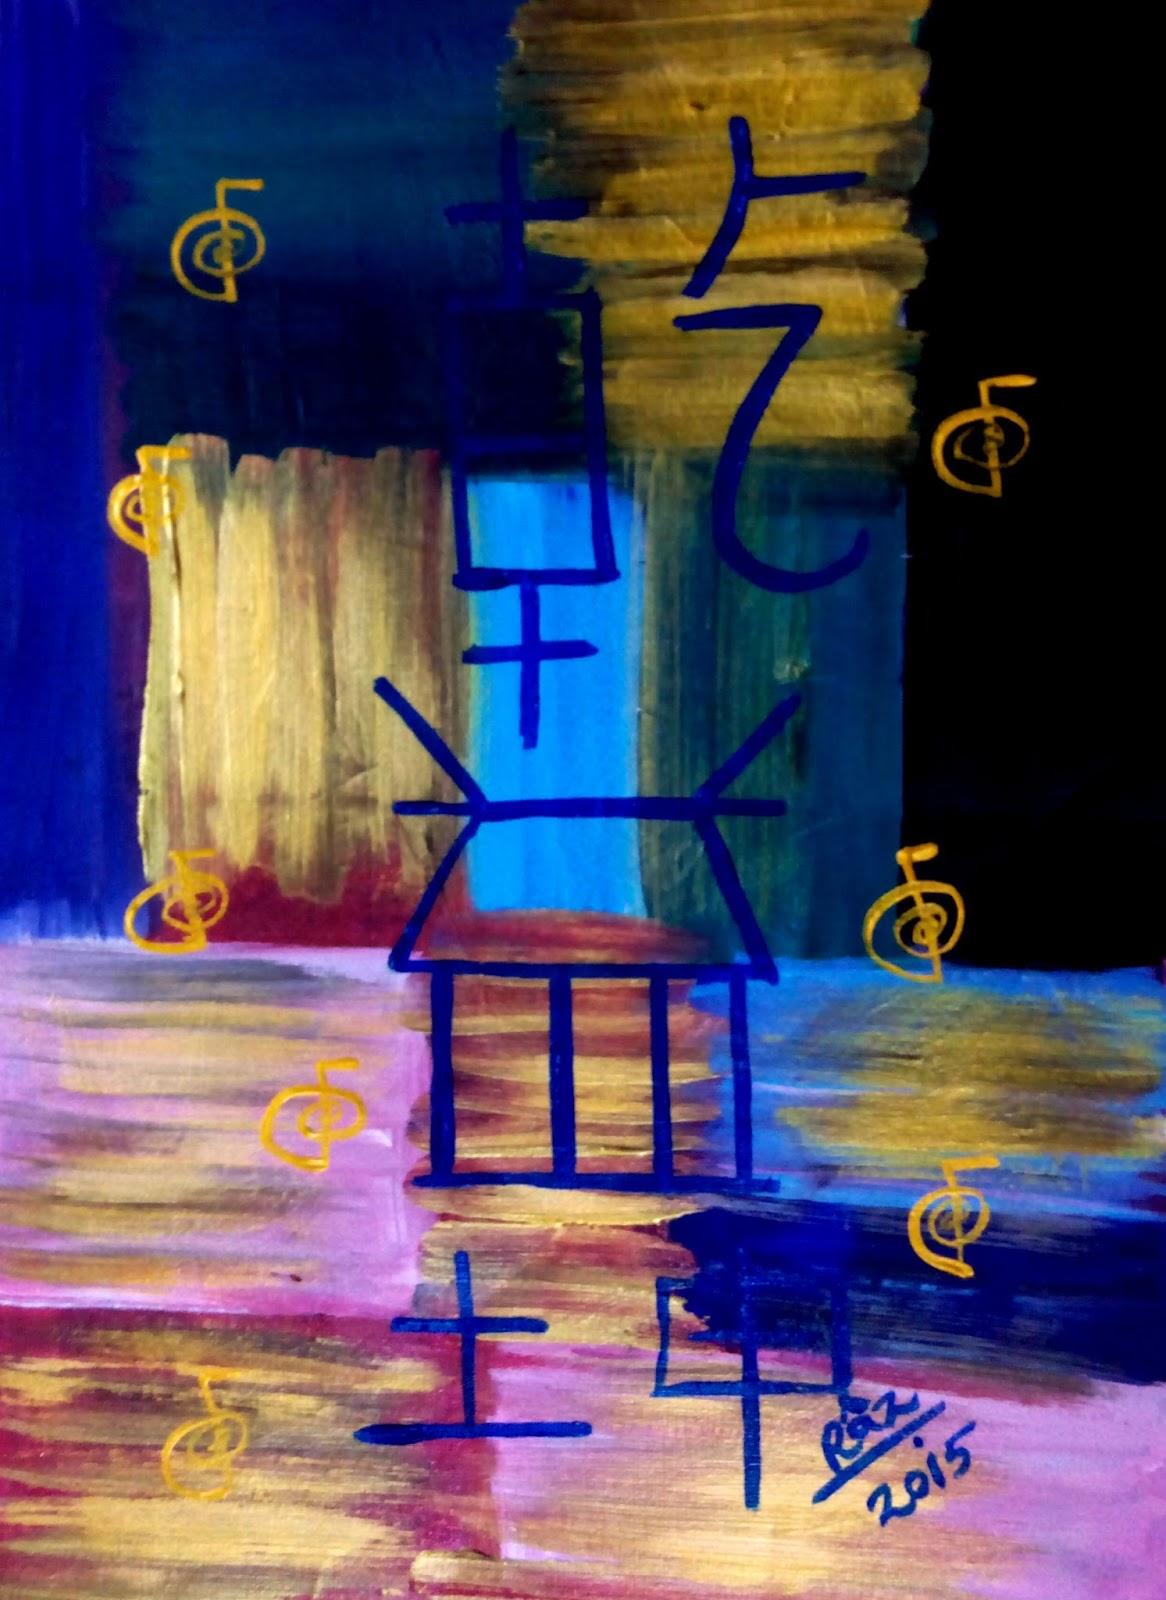 feng shui office studio heaven increases success acrylic on oil sketch paper rizwana mundewadi acoustics feng shui